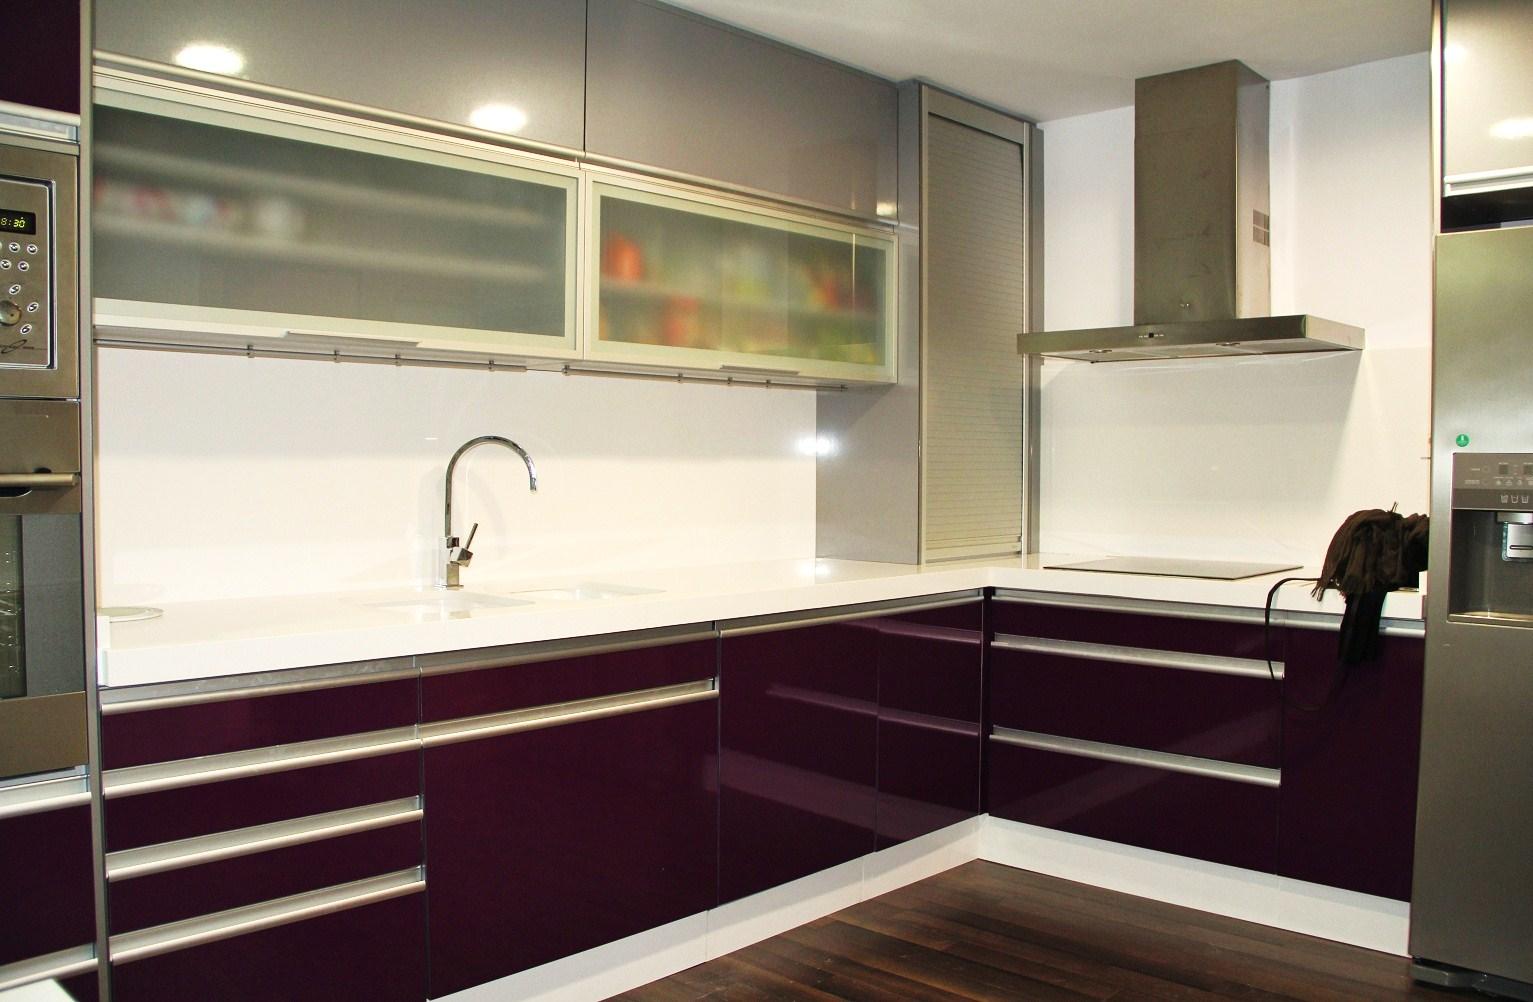 Dise o cocinas valencia y mobiliario para cocinas for Cocinas diseno valencia